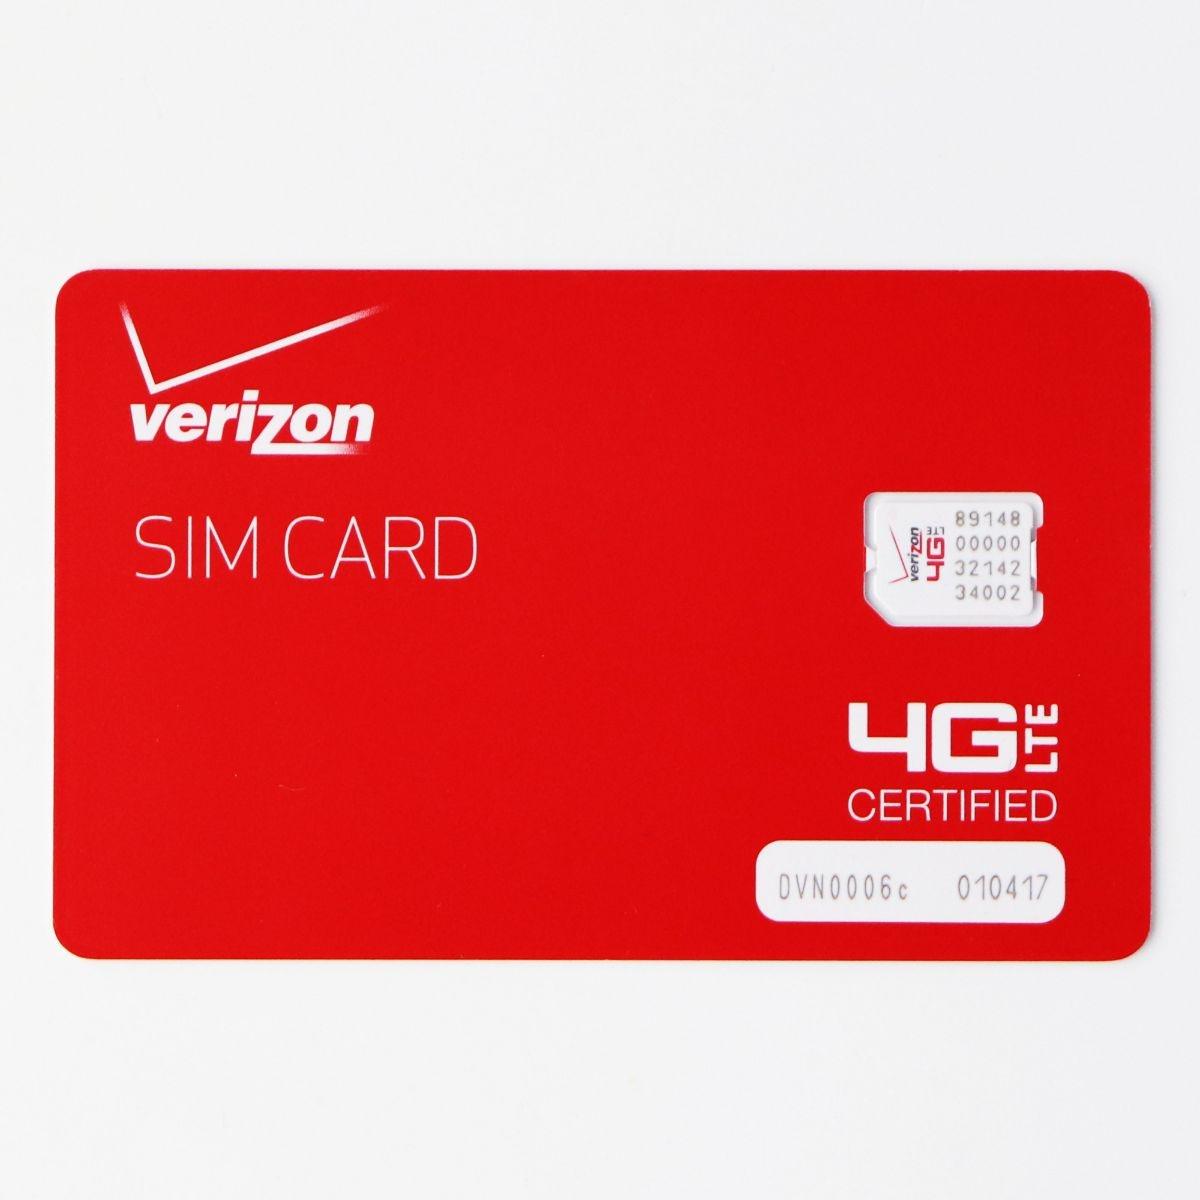 Verizon Nano Sized SIM Card 4G LTE (BULK4FF-NFC-D) (Refurbished)